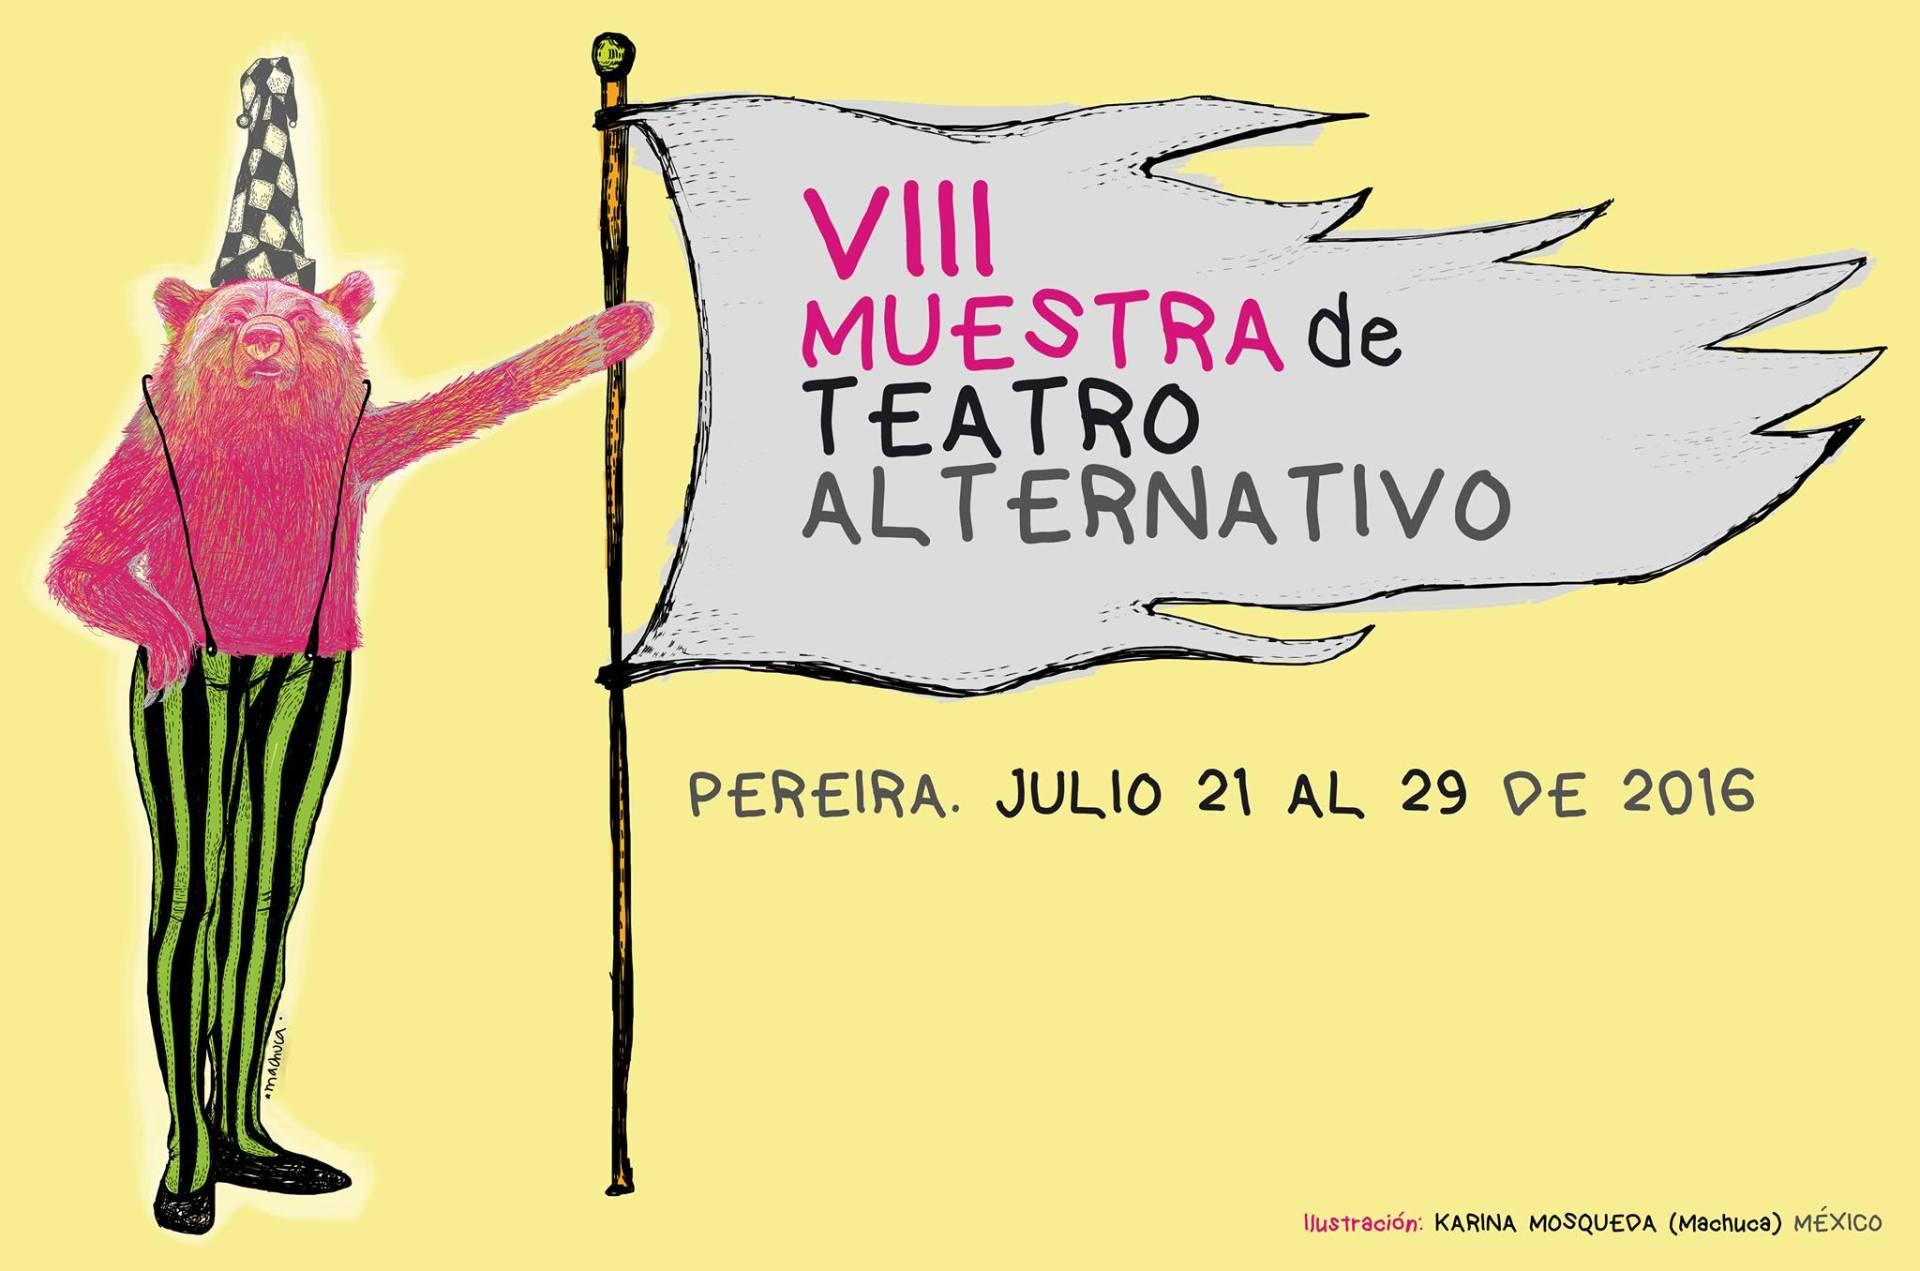 http://teatroalternativopereira.blogspot.com.co/